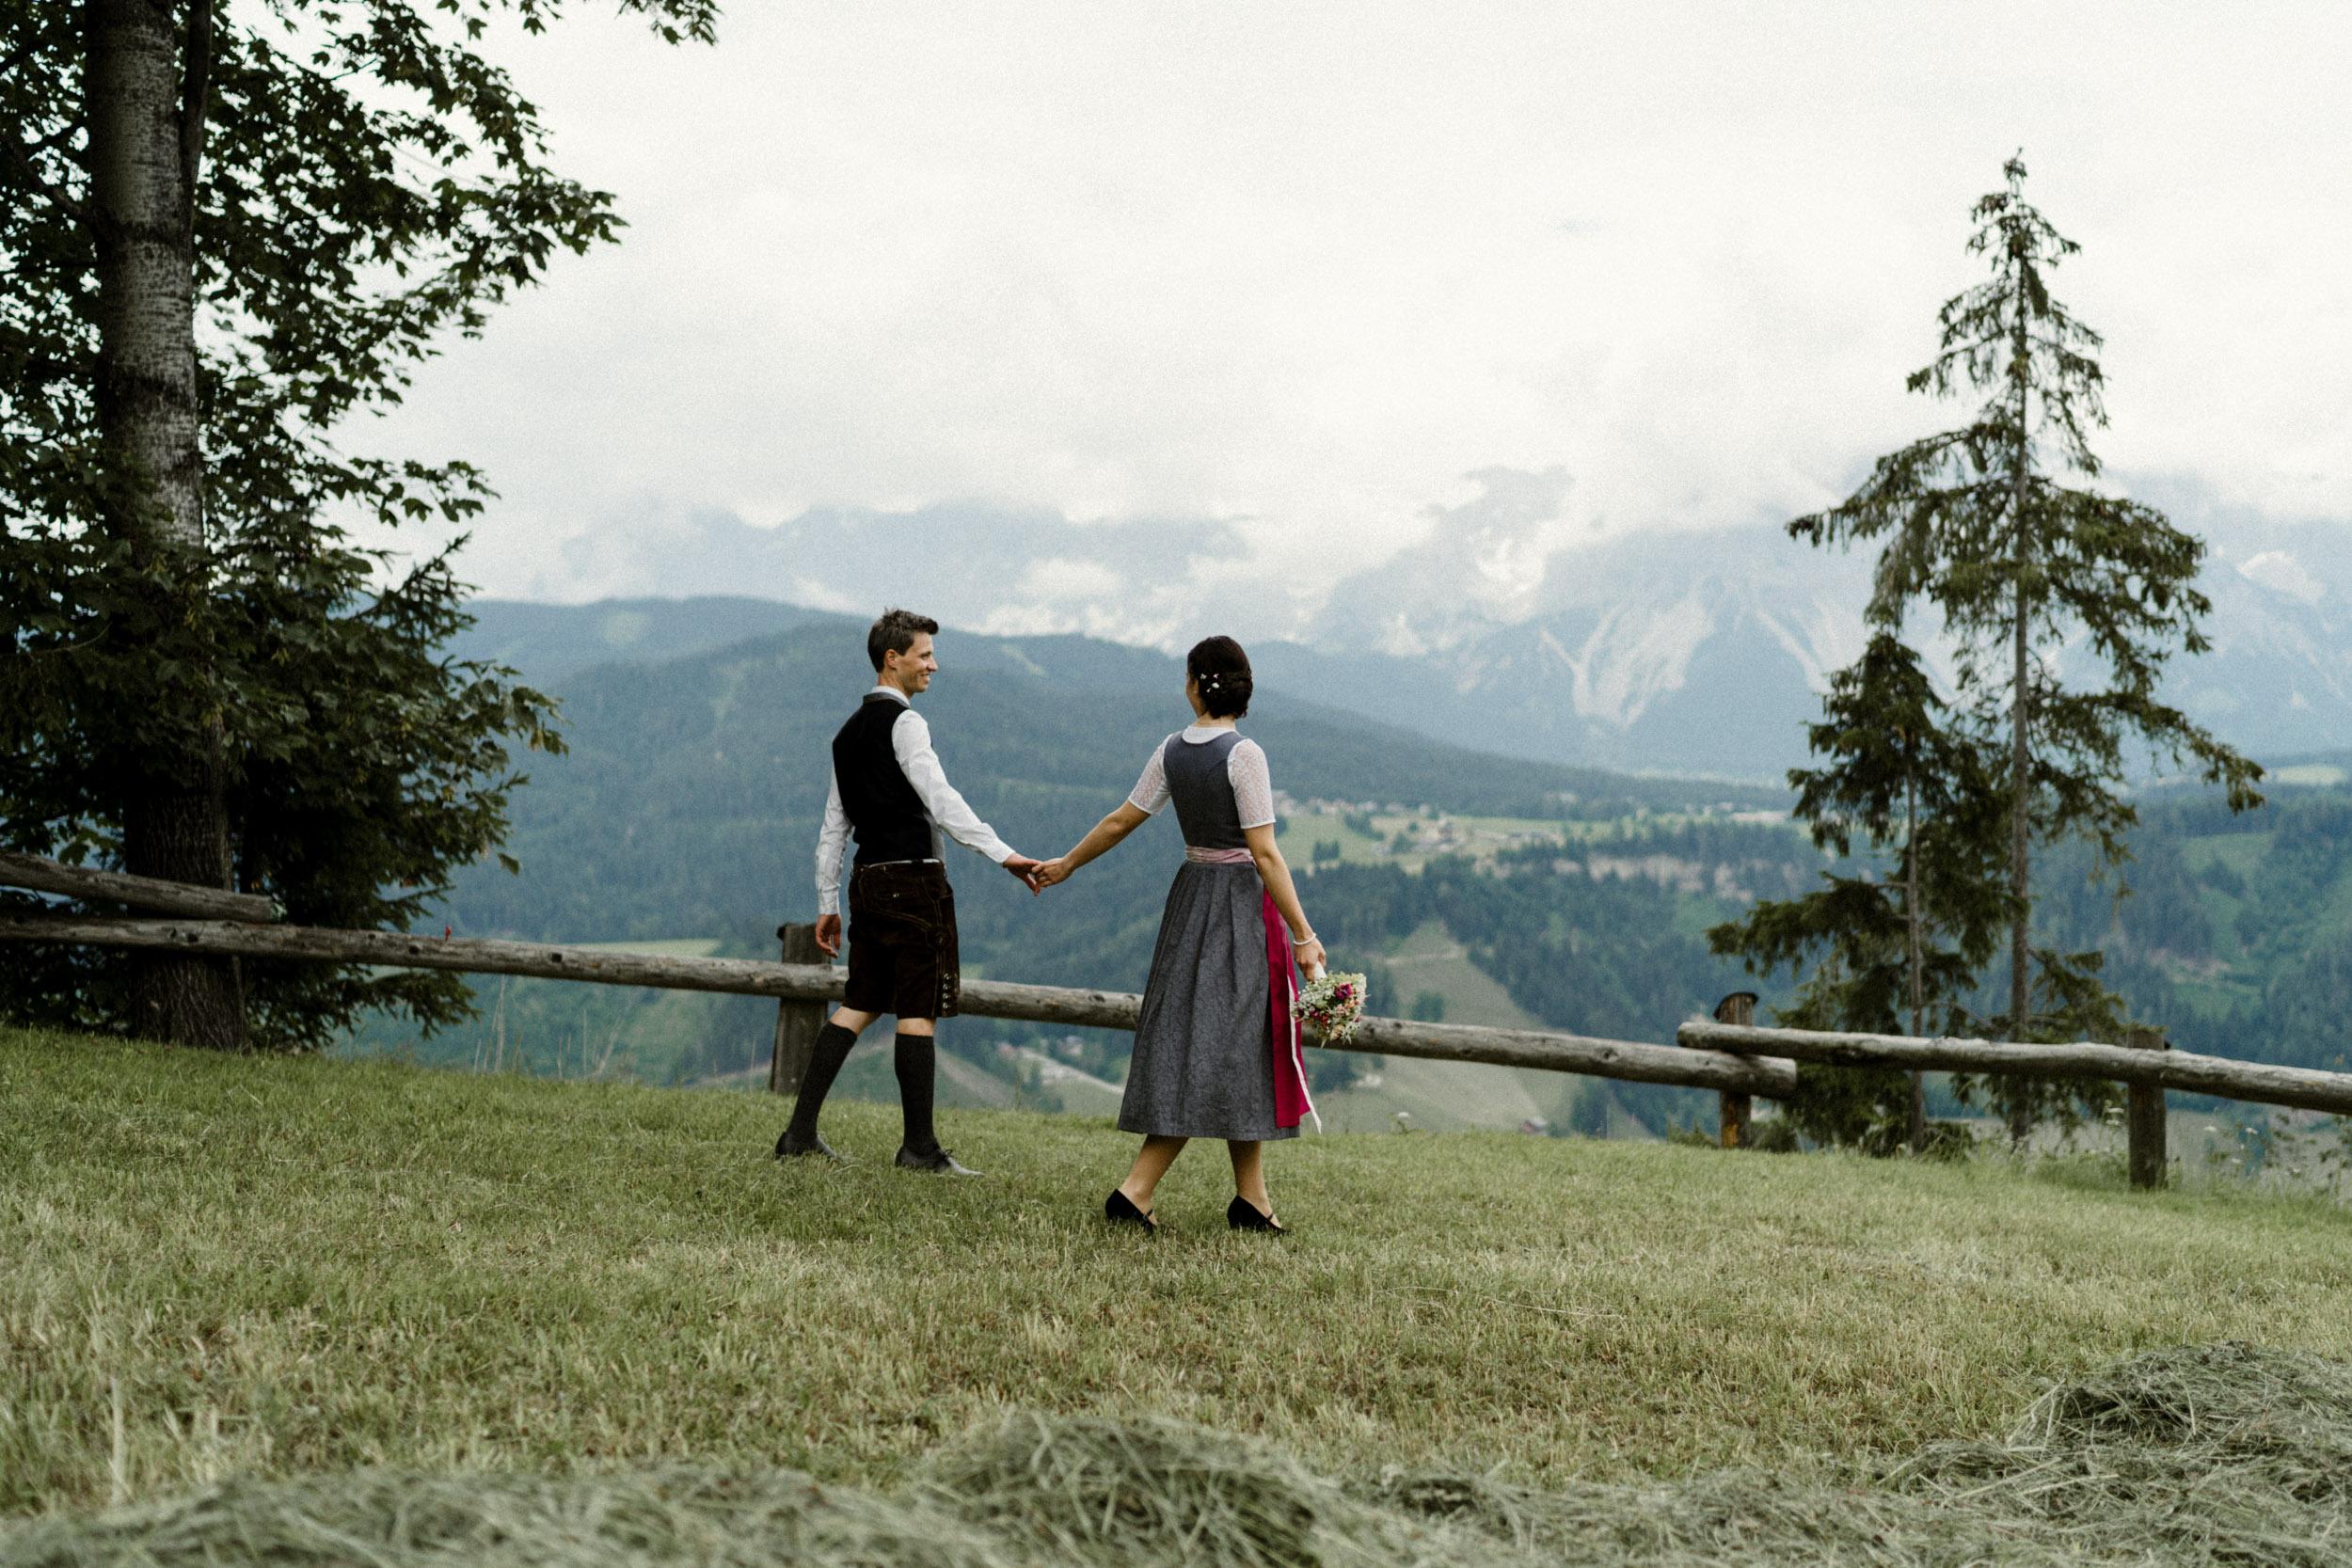 austria_mountain_wedding_photography_countryside_vienna-14.jpg